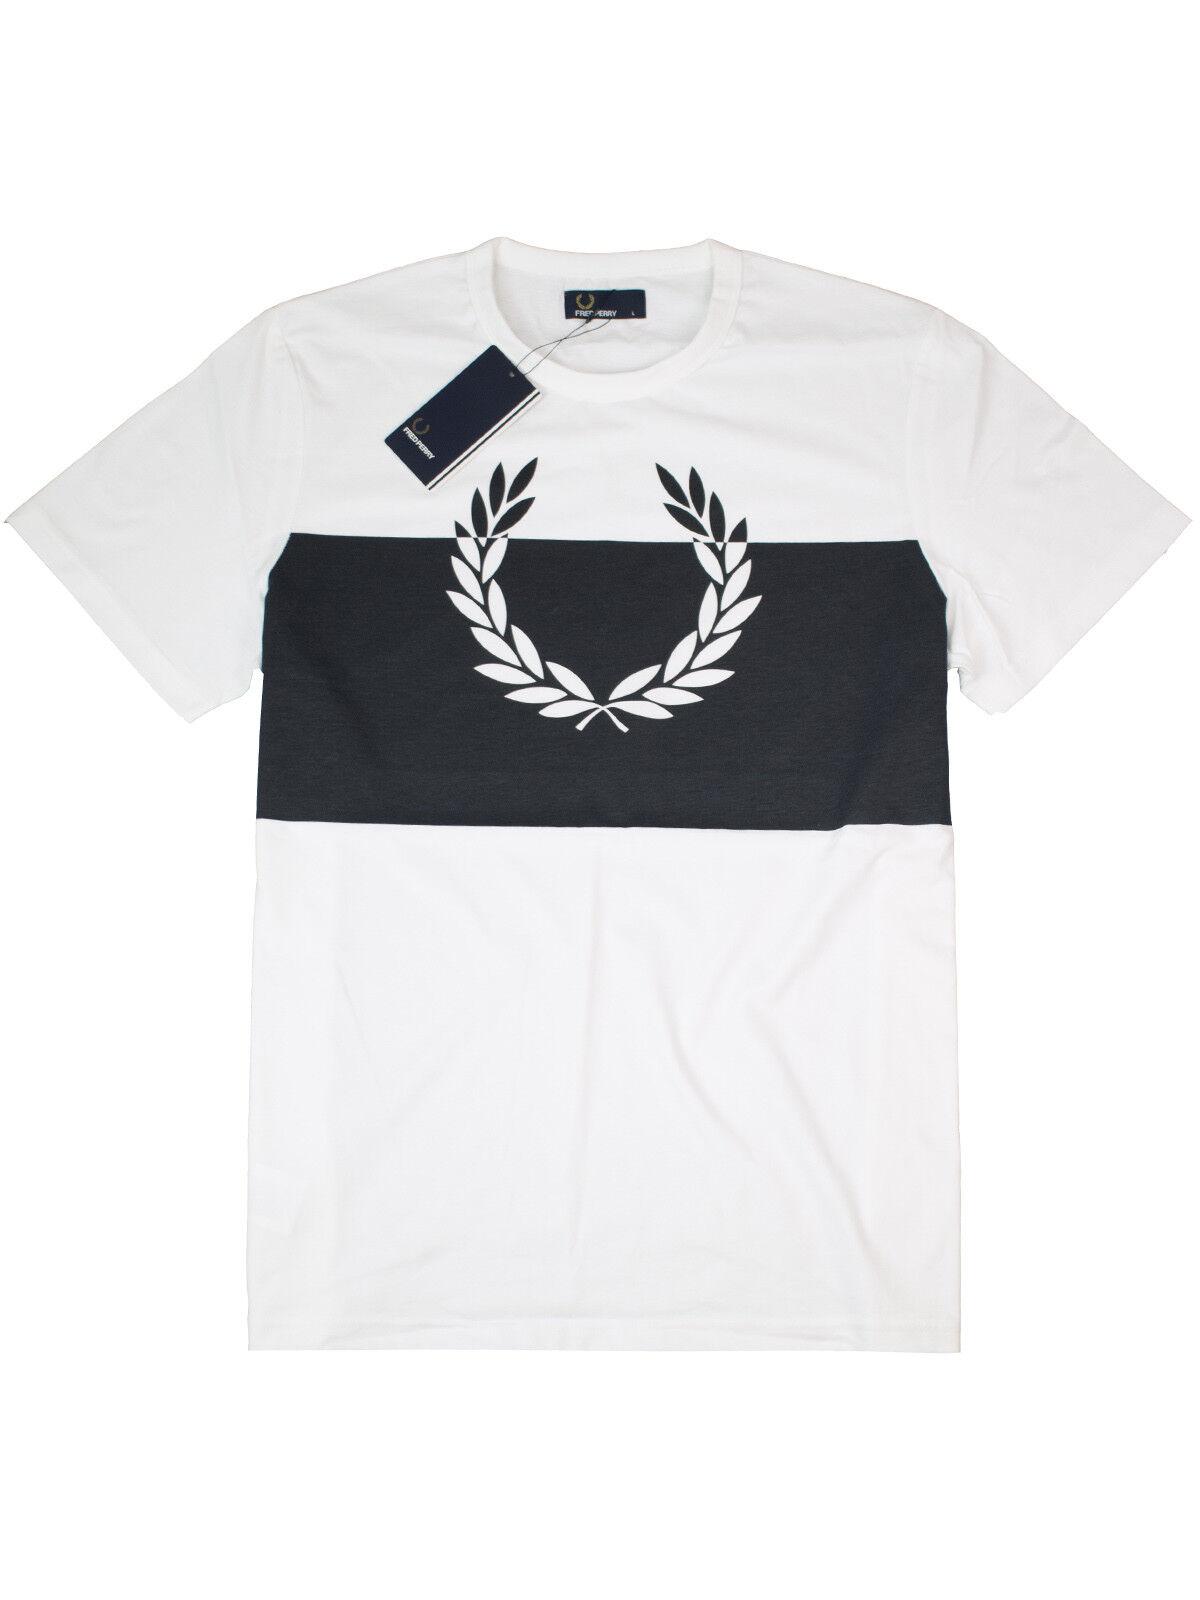 FROT Perry T-Shirt Laurel Wreath Print M4546 100 Weiß / Navy Lorbeerkranz  7401